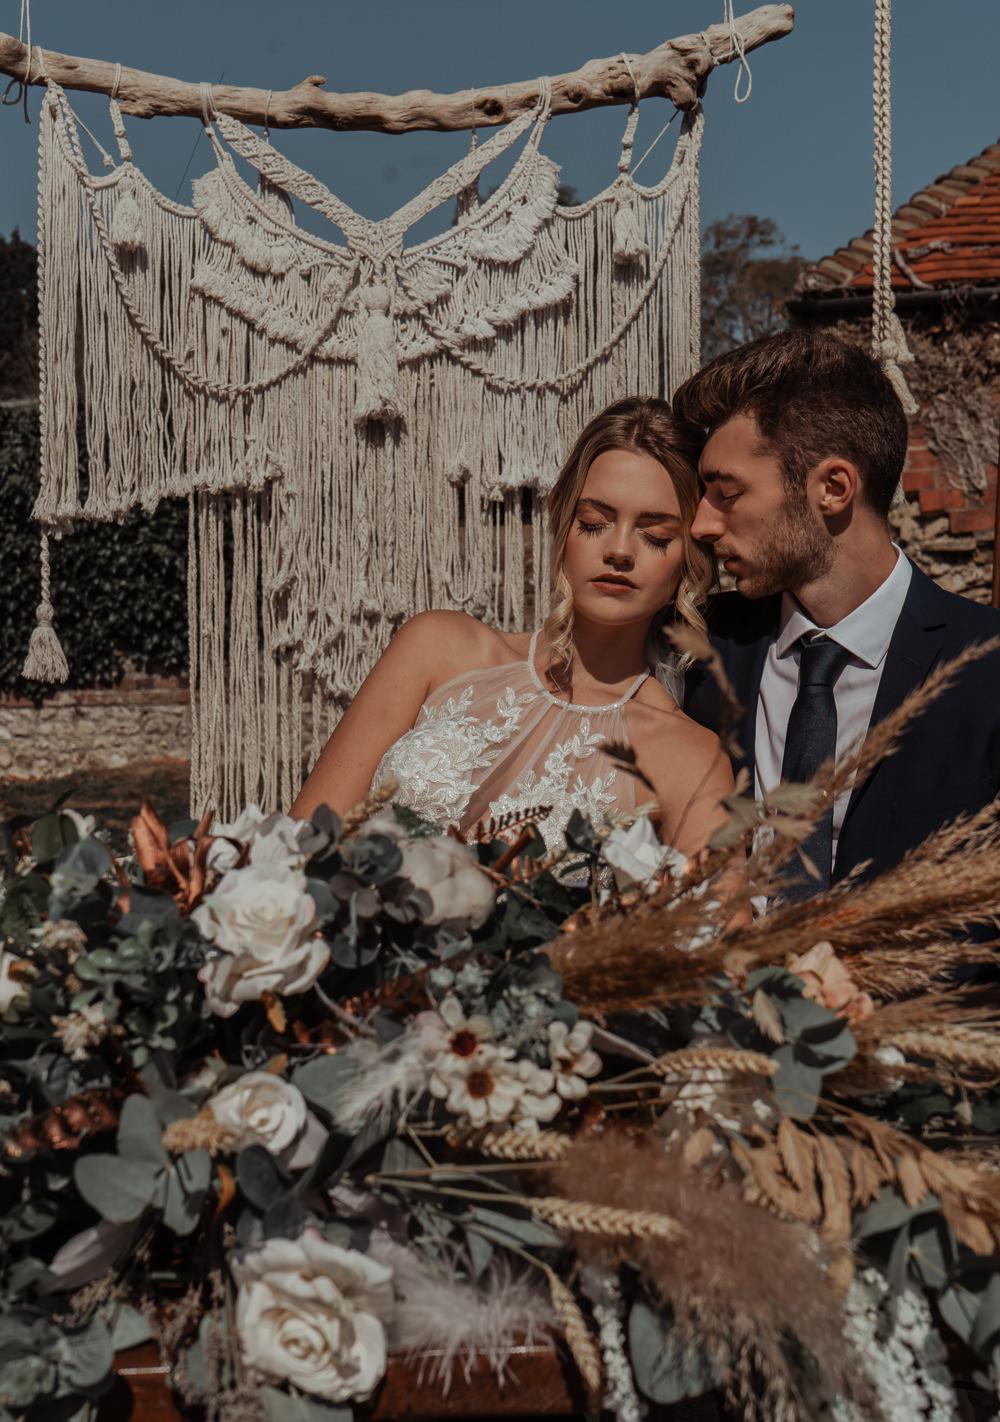 Intimate Wedding Ideas Imogen Eve Photography Outdoor Reception Macrame Backdrop Rustic Wooden Tables Decor